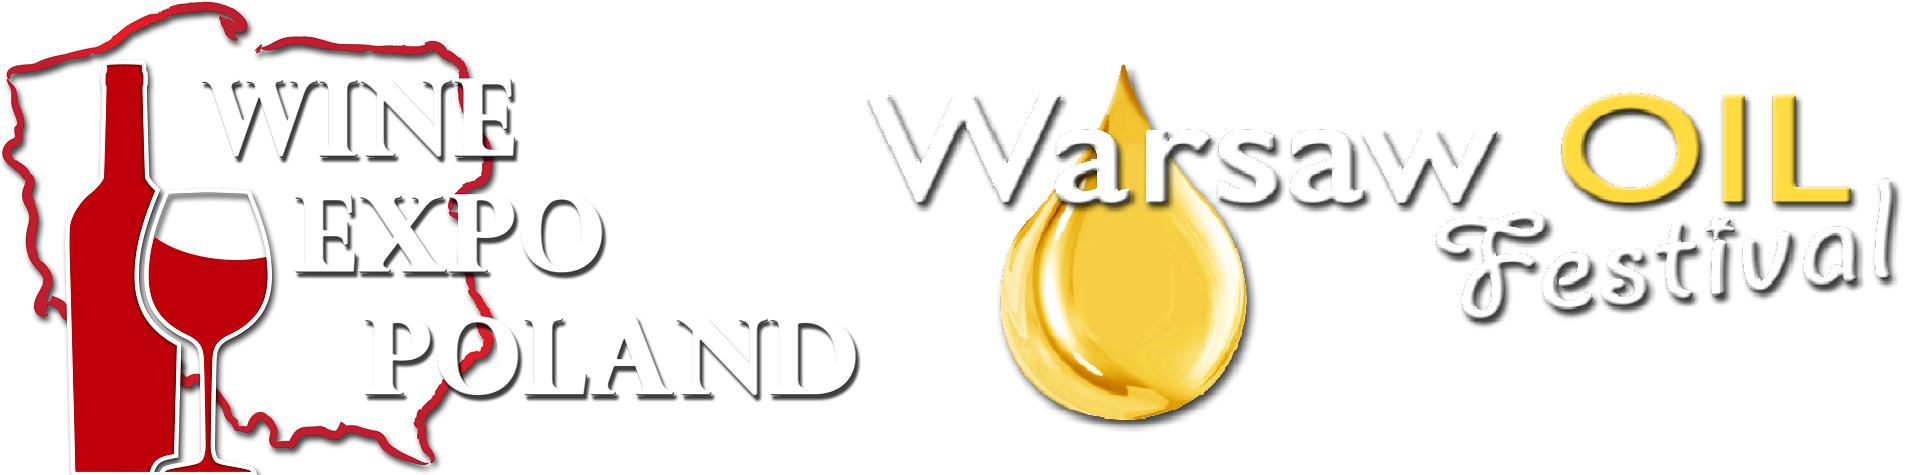 Targi Wine Expo Poland i Warsaw Oil Festival 2018